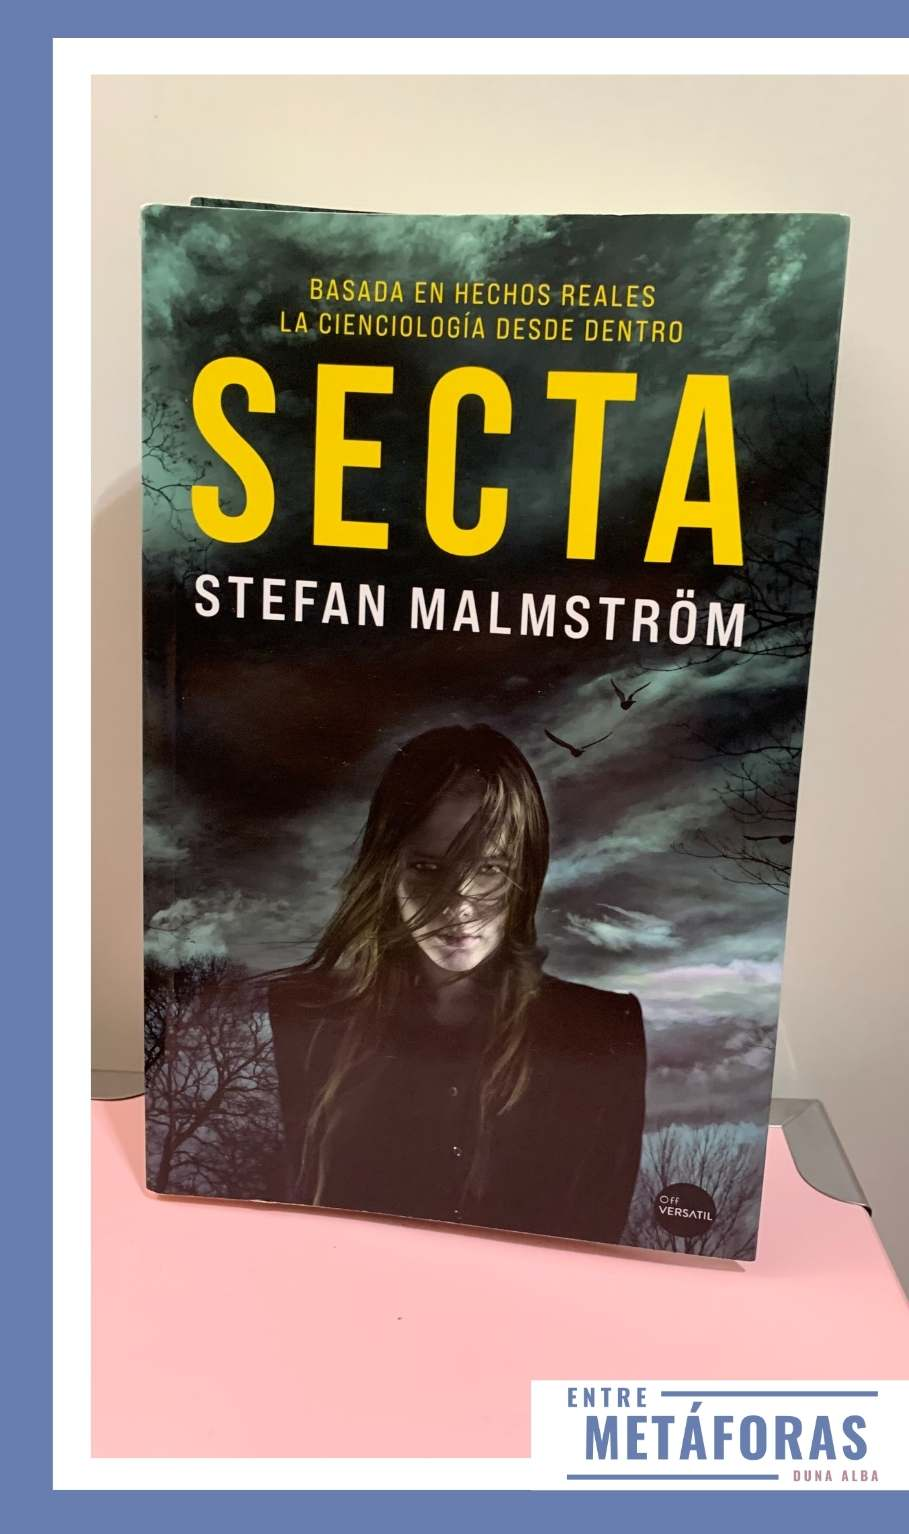 Secta, de Stefan malmström